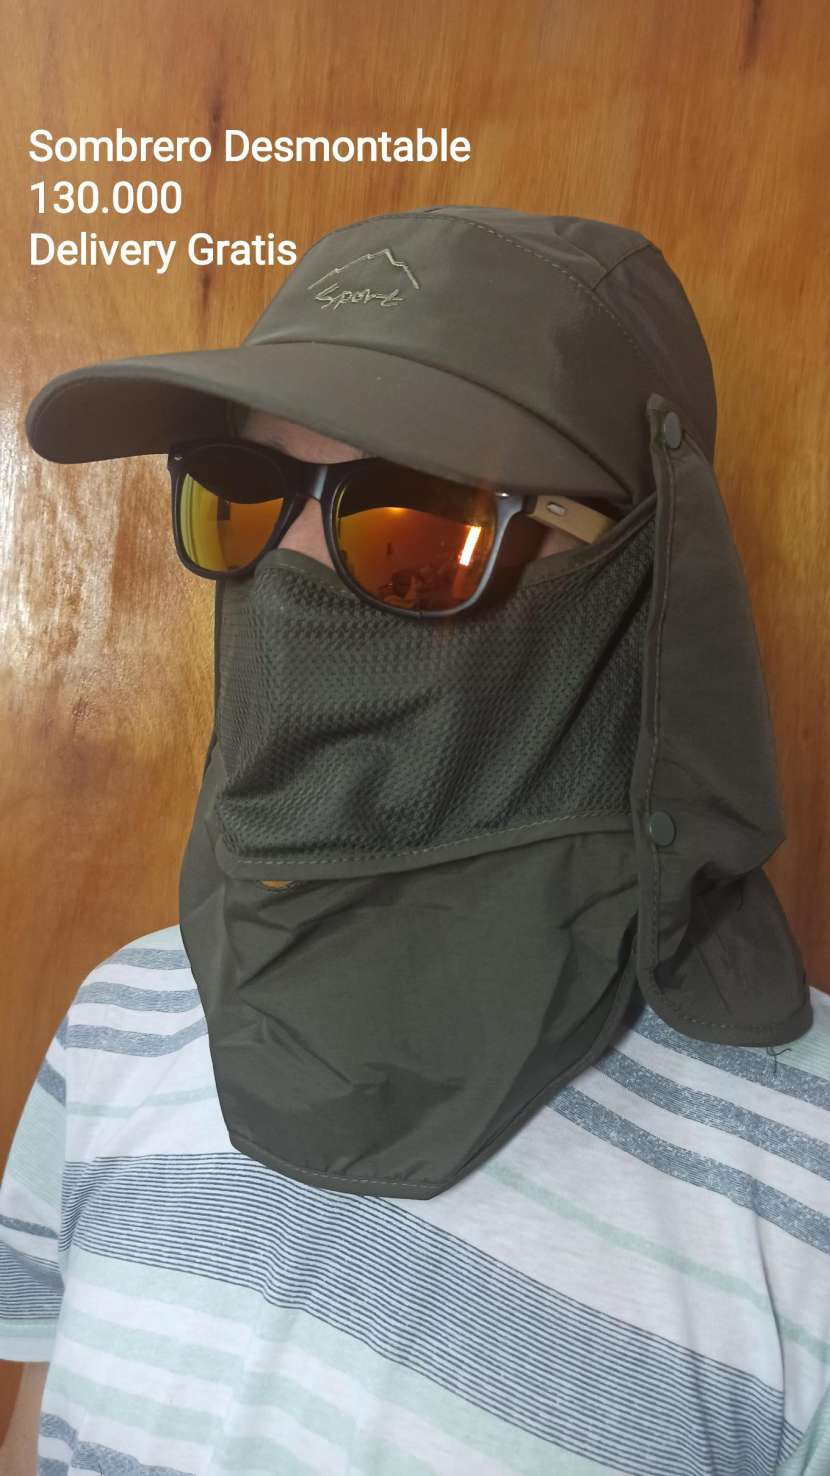 Sombrero desmontable - 0